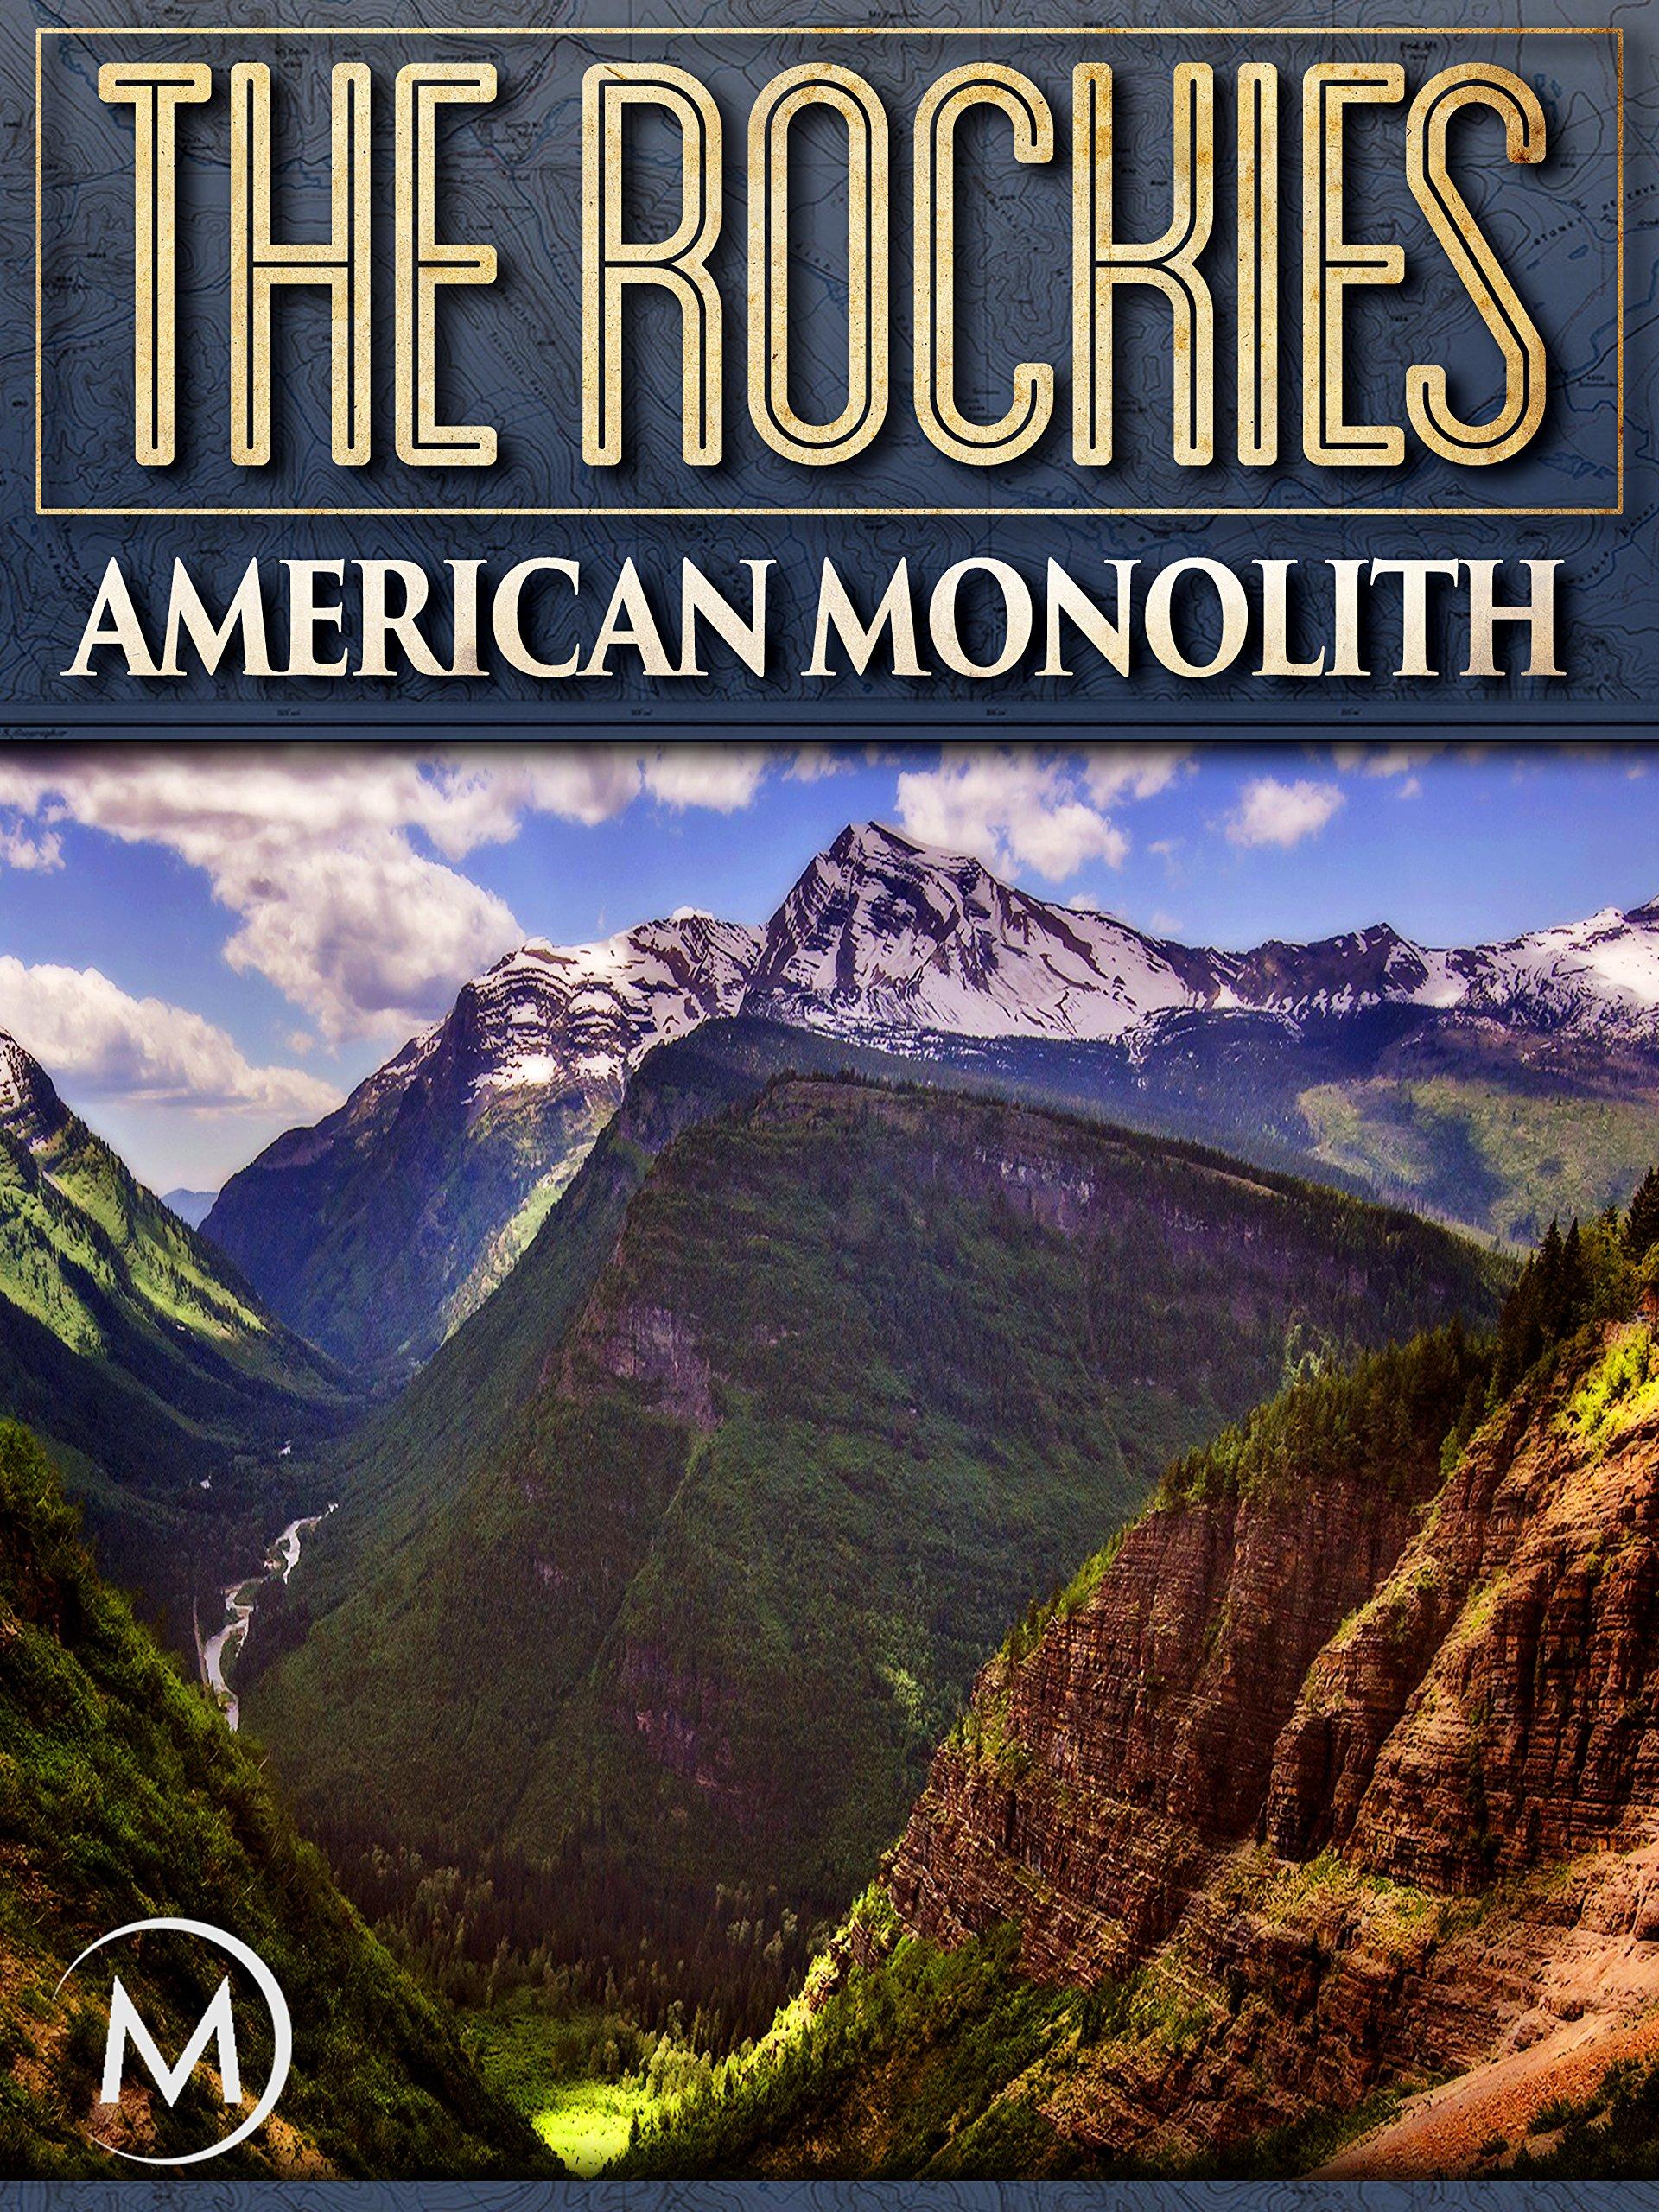 The Rockies: American Monolith on Amazon Prime Video UK